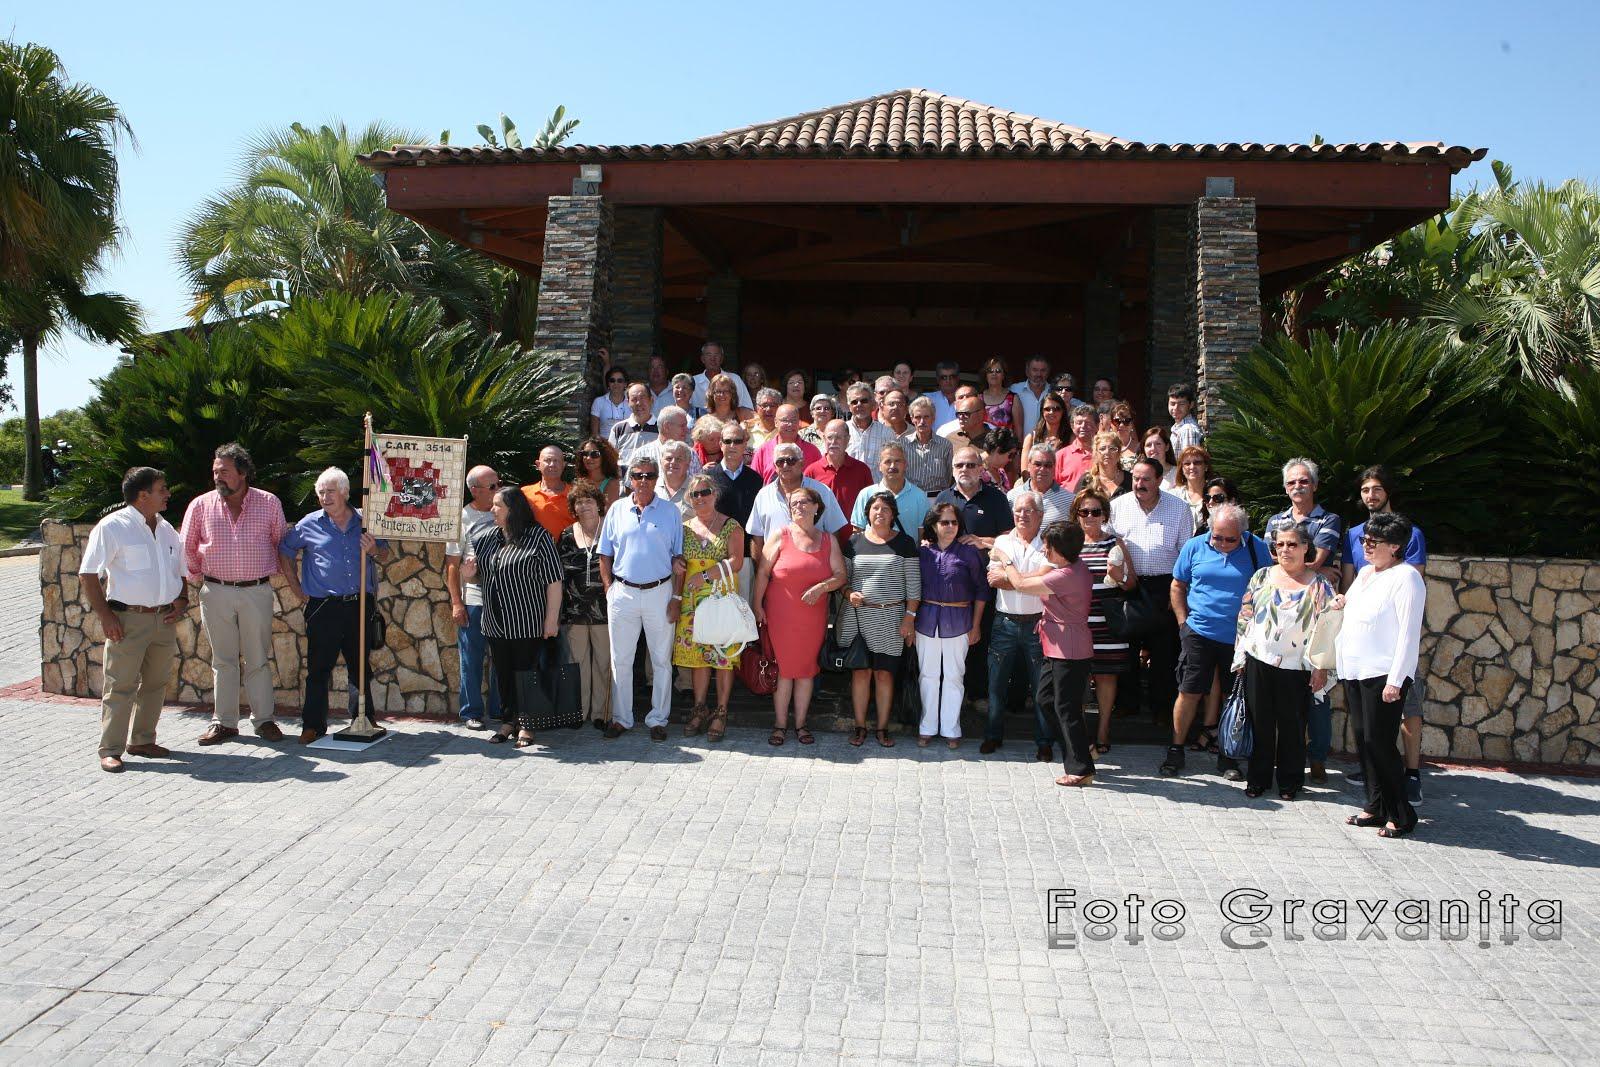 8º Convívio Lagoa 2013 - 2